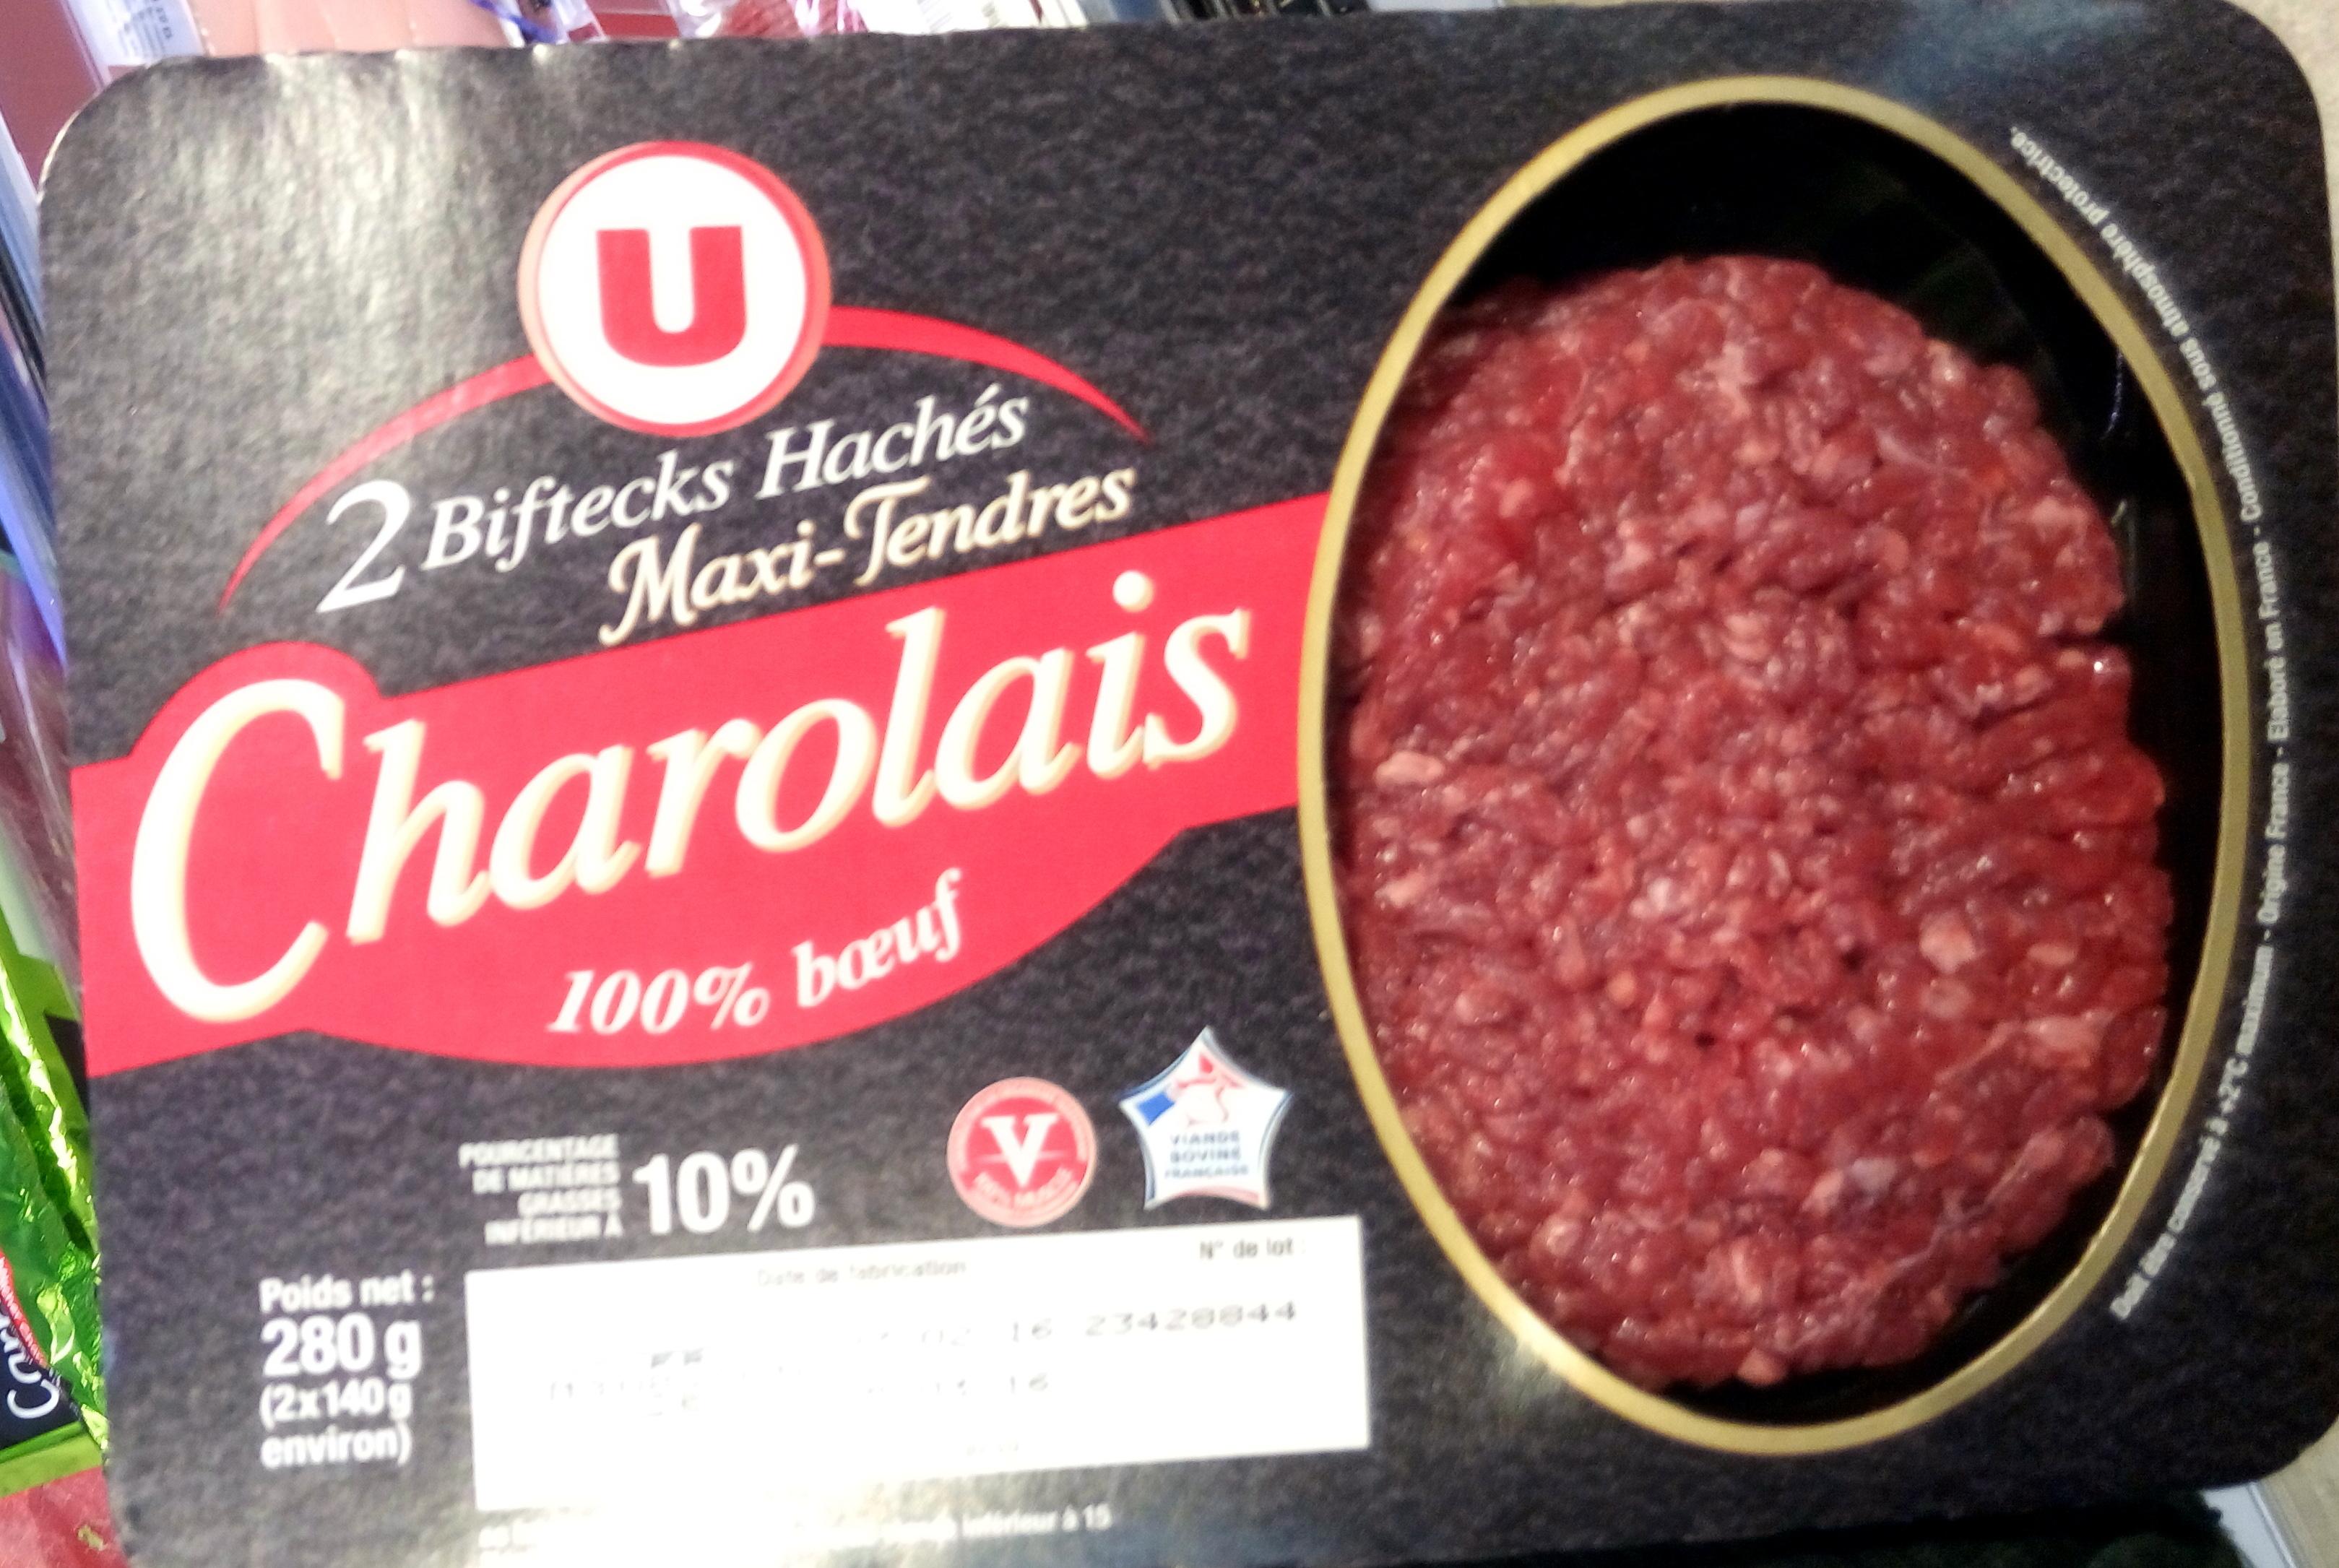 2 biftecks hachés maxi-tendres Charolais - Product